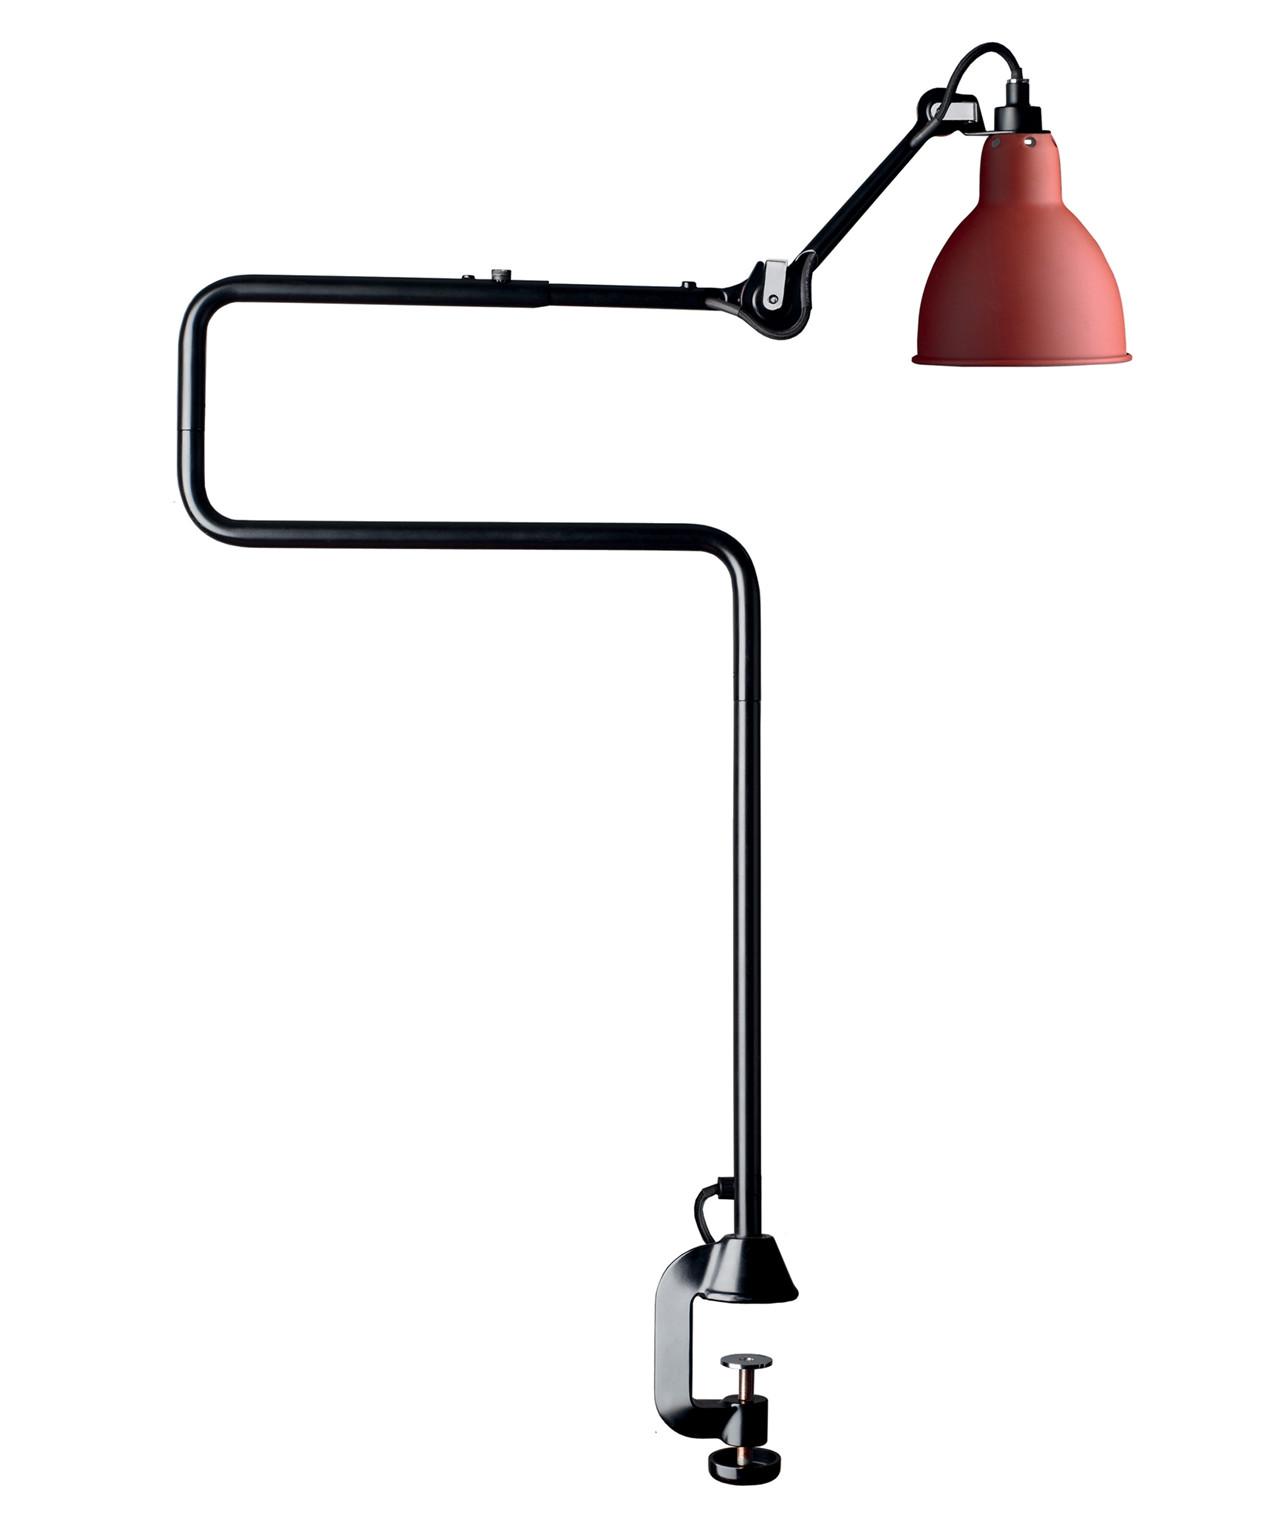 Image of   211-311 Bordlampe Rød - Lampe Gras